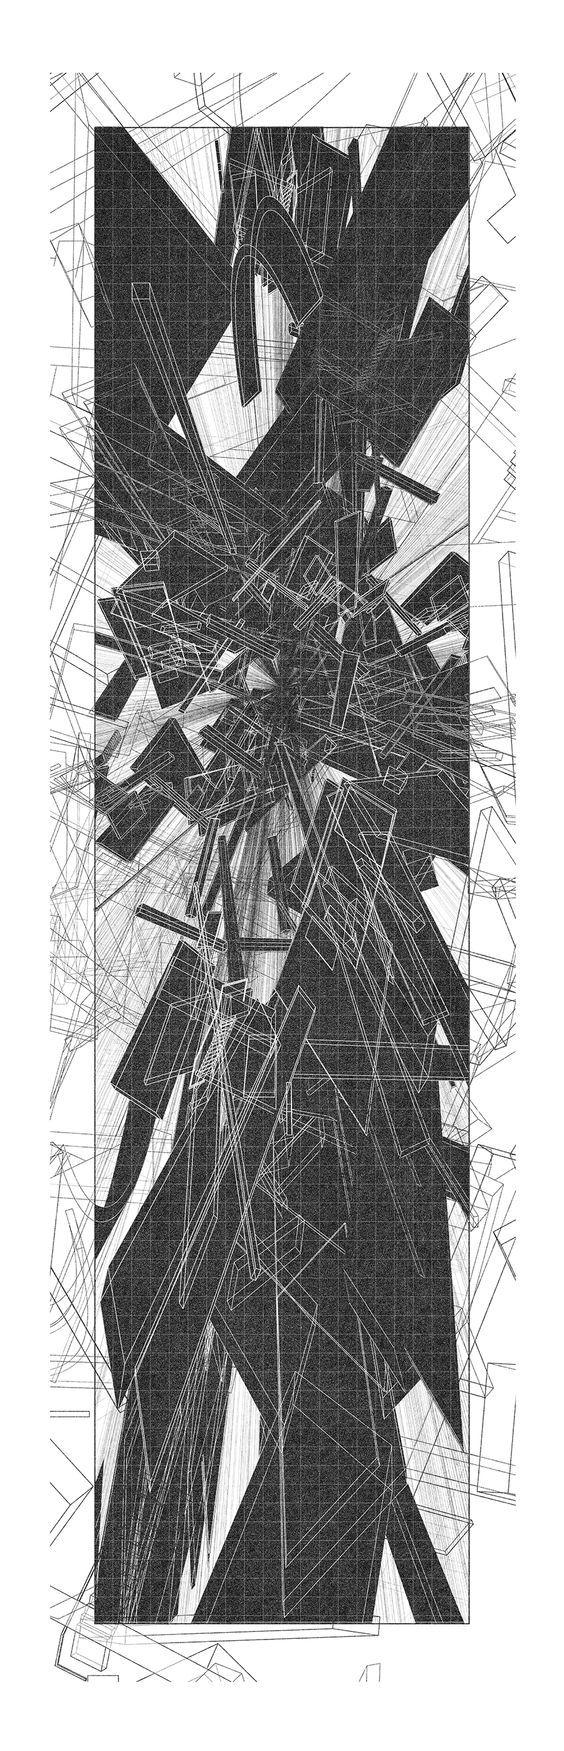 The House of Terrestrial Constellations - Benjamin Ruswick: